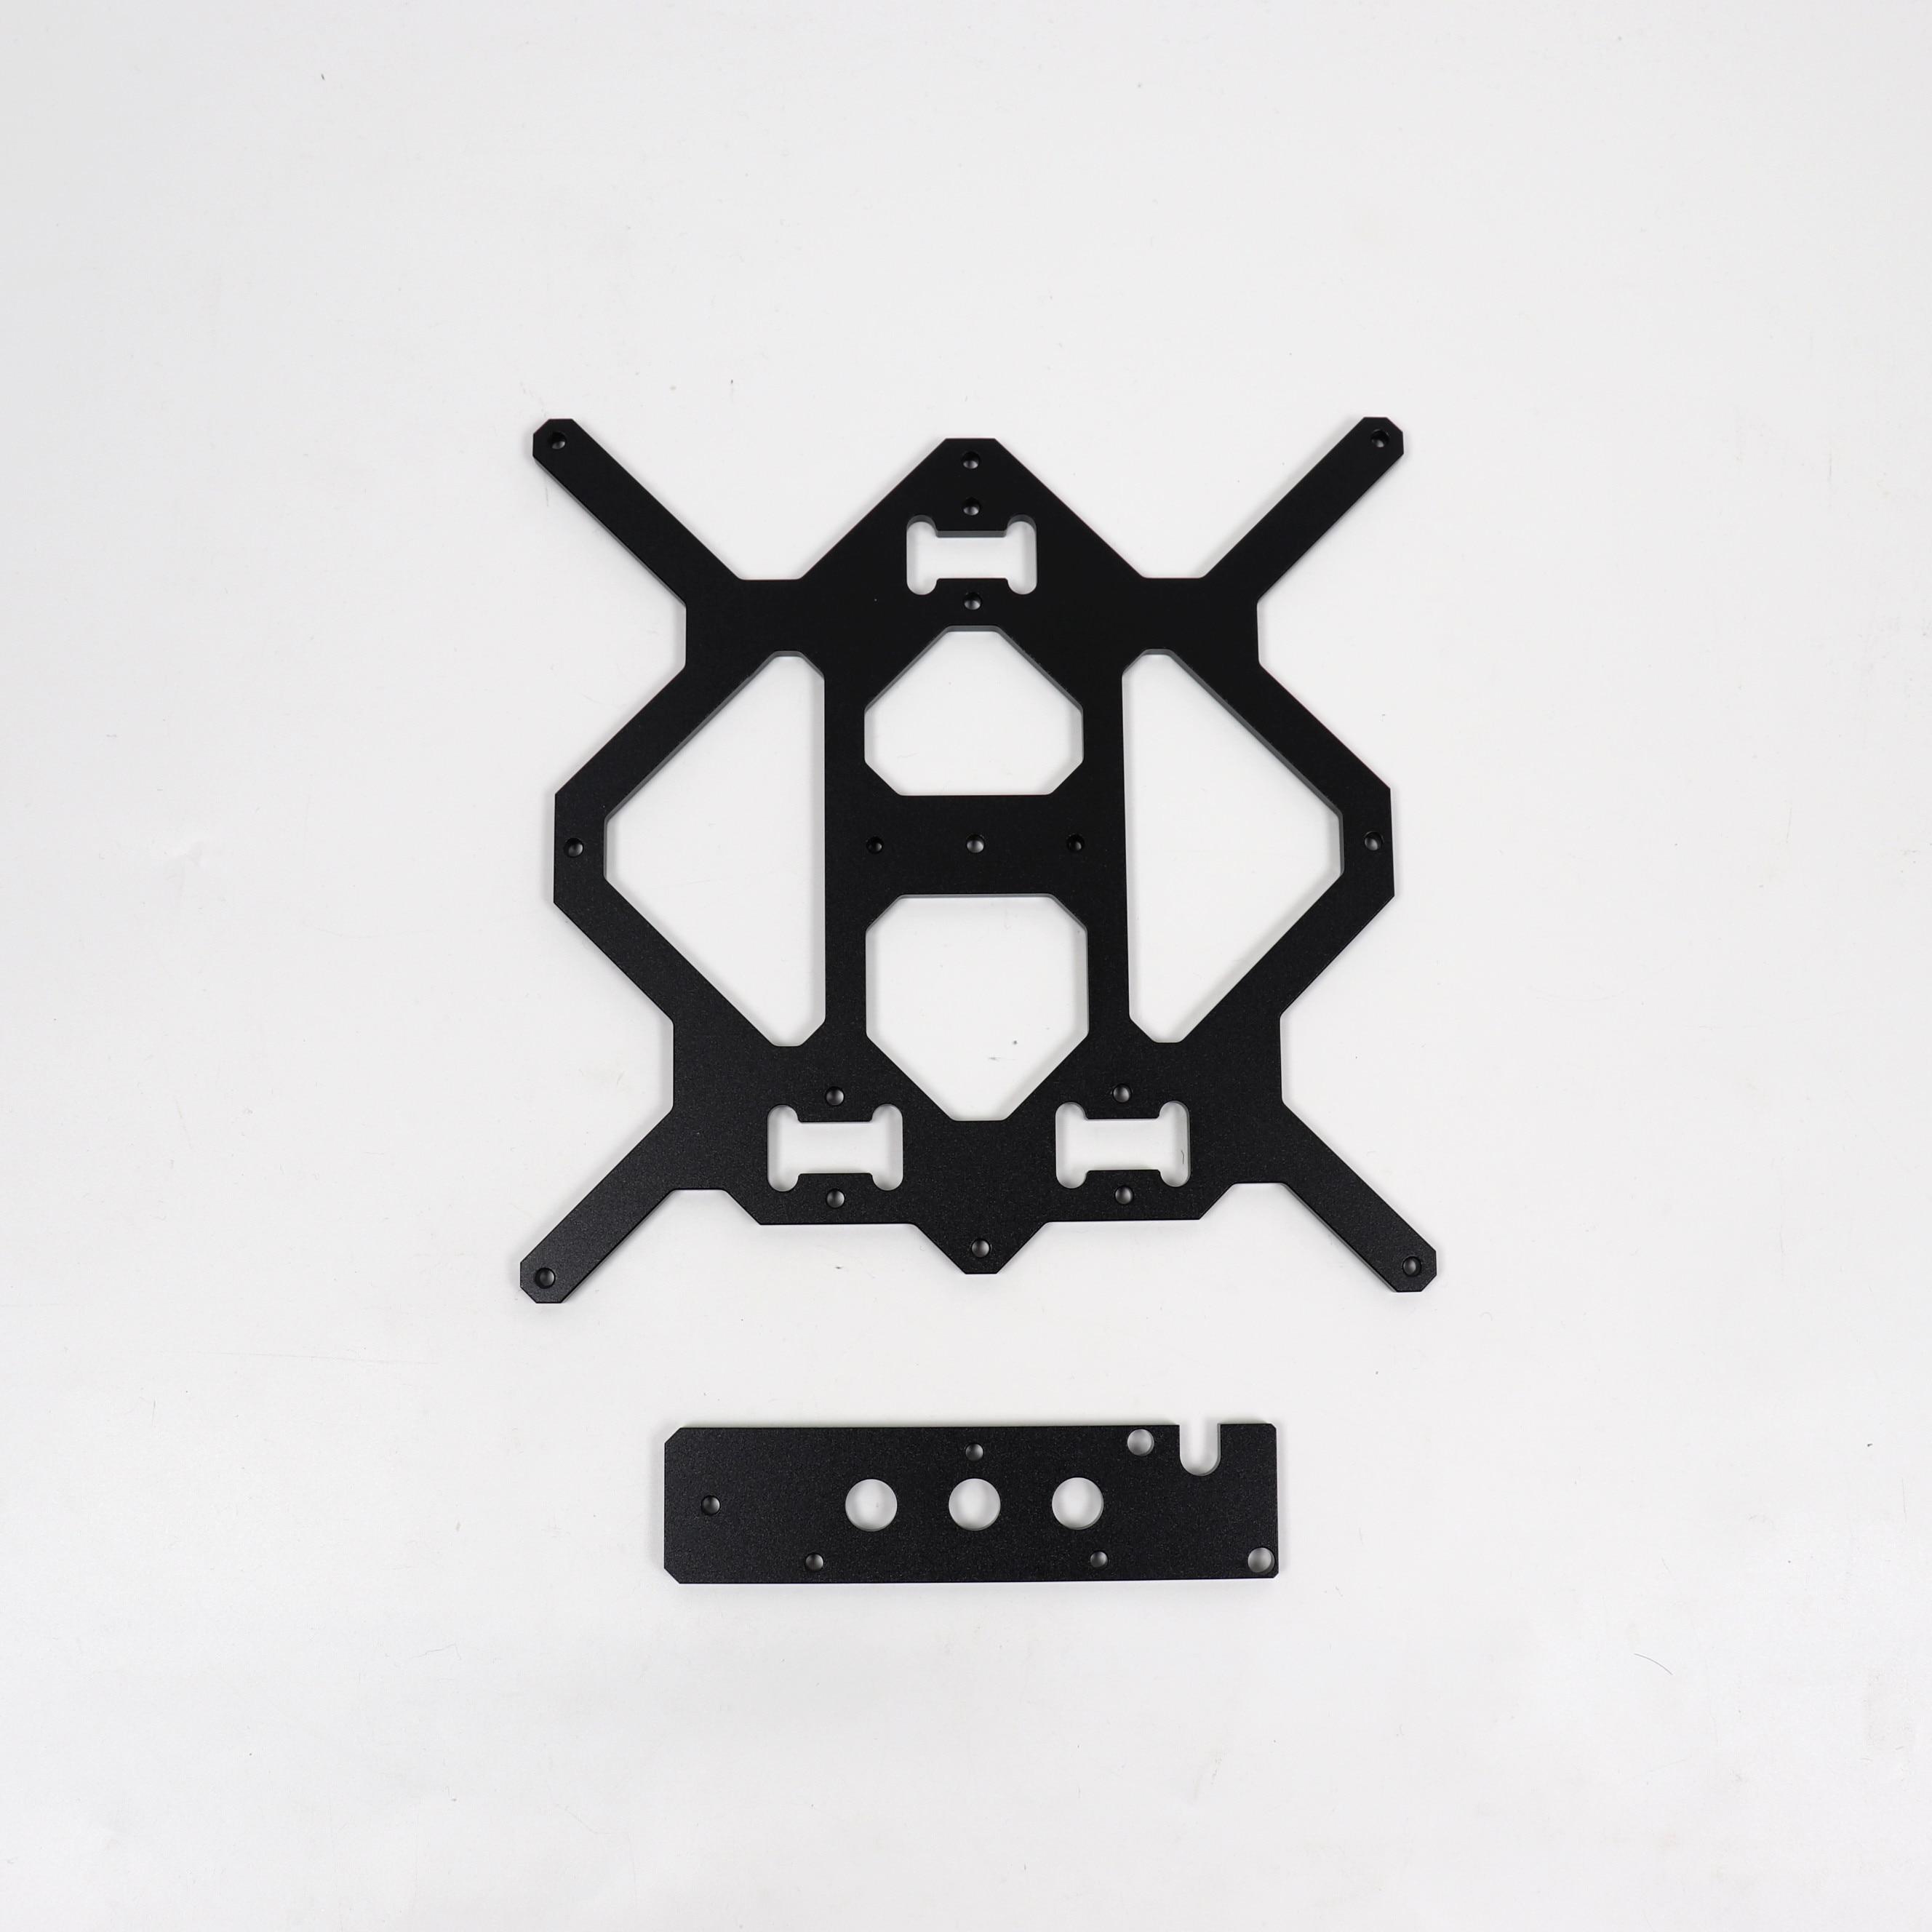 Blurolls Y Carriage And Z Bottom Plate For Original Prusa Mini 3d Printer